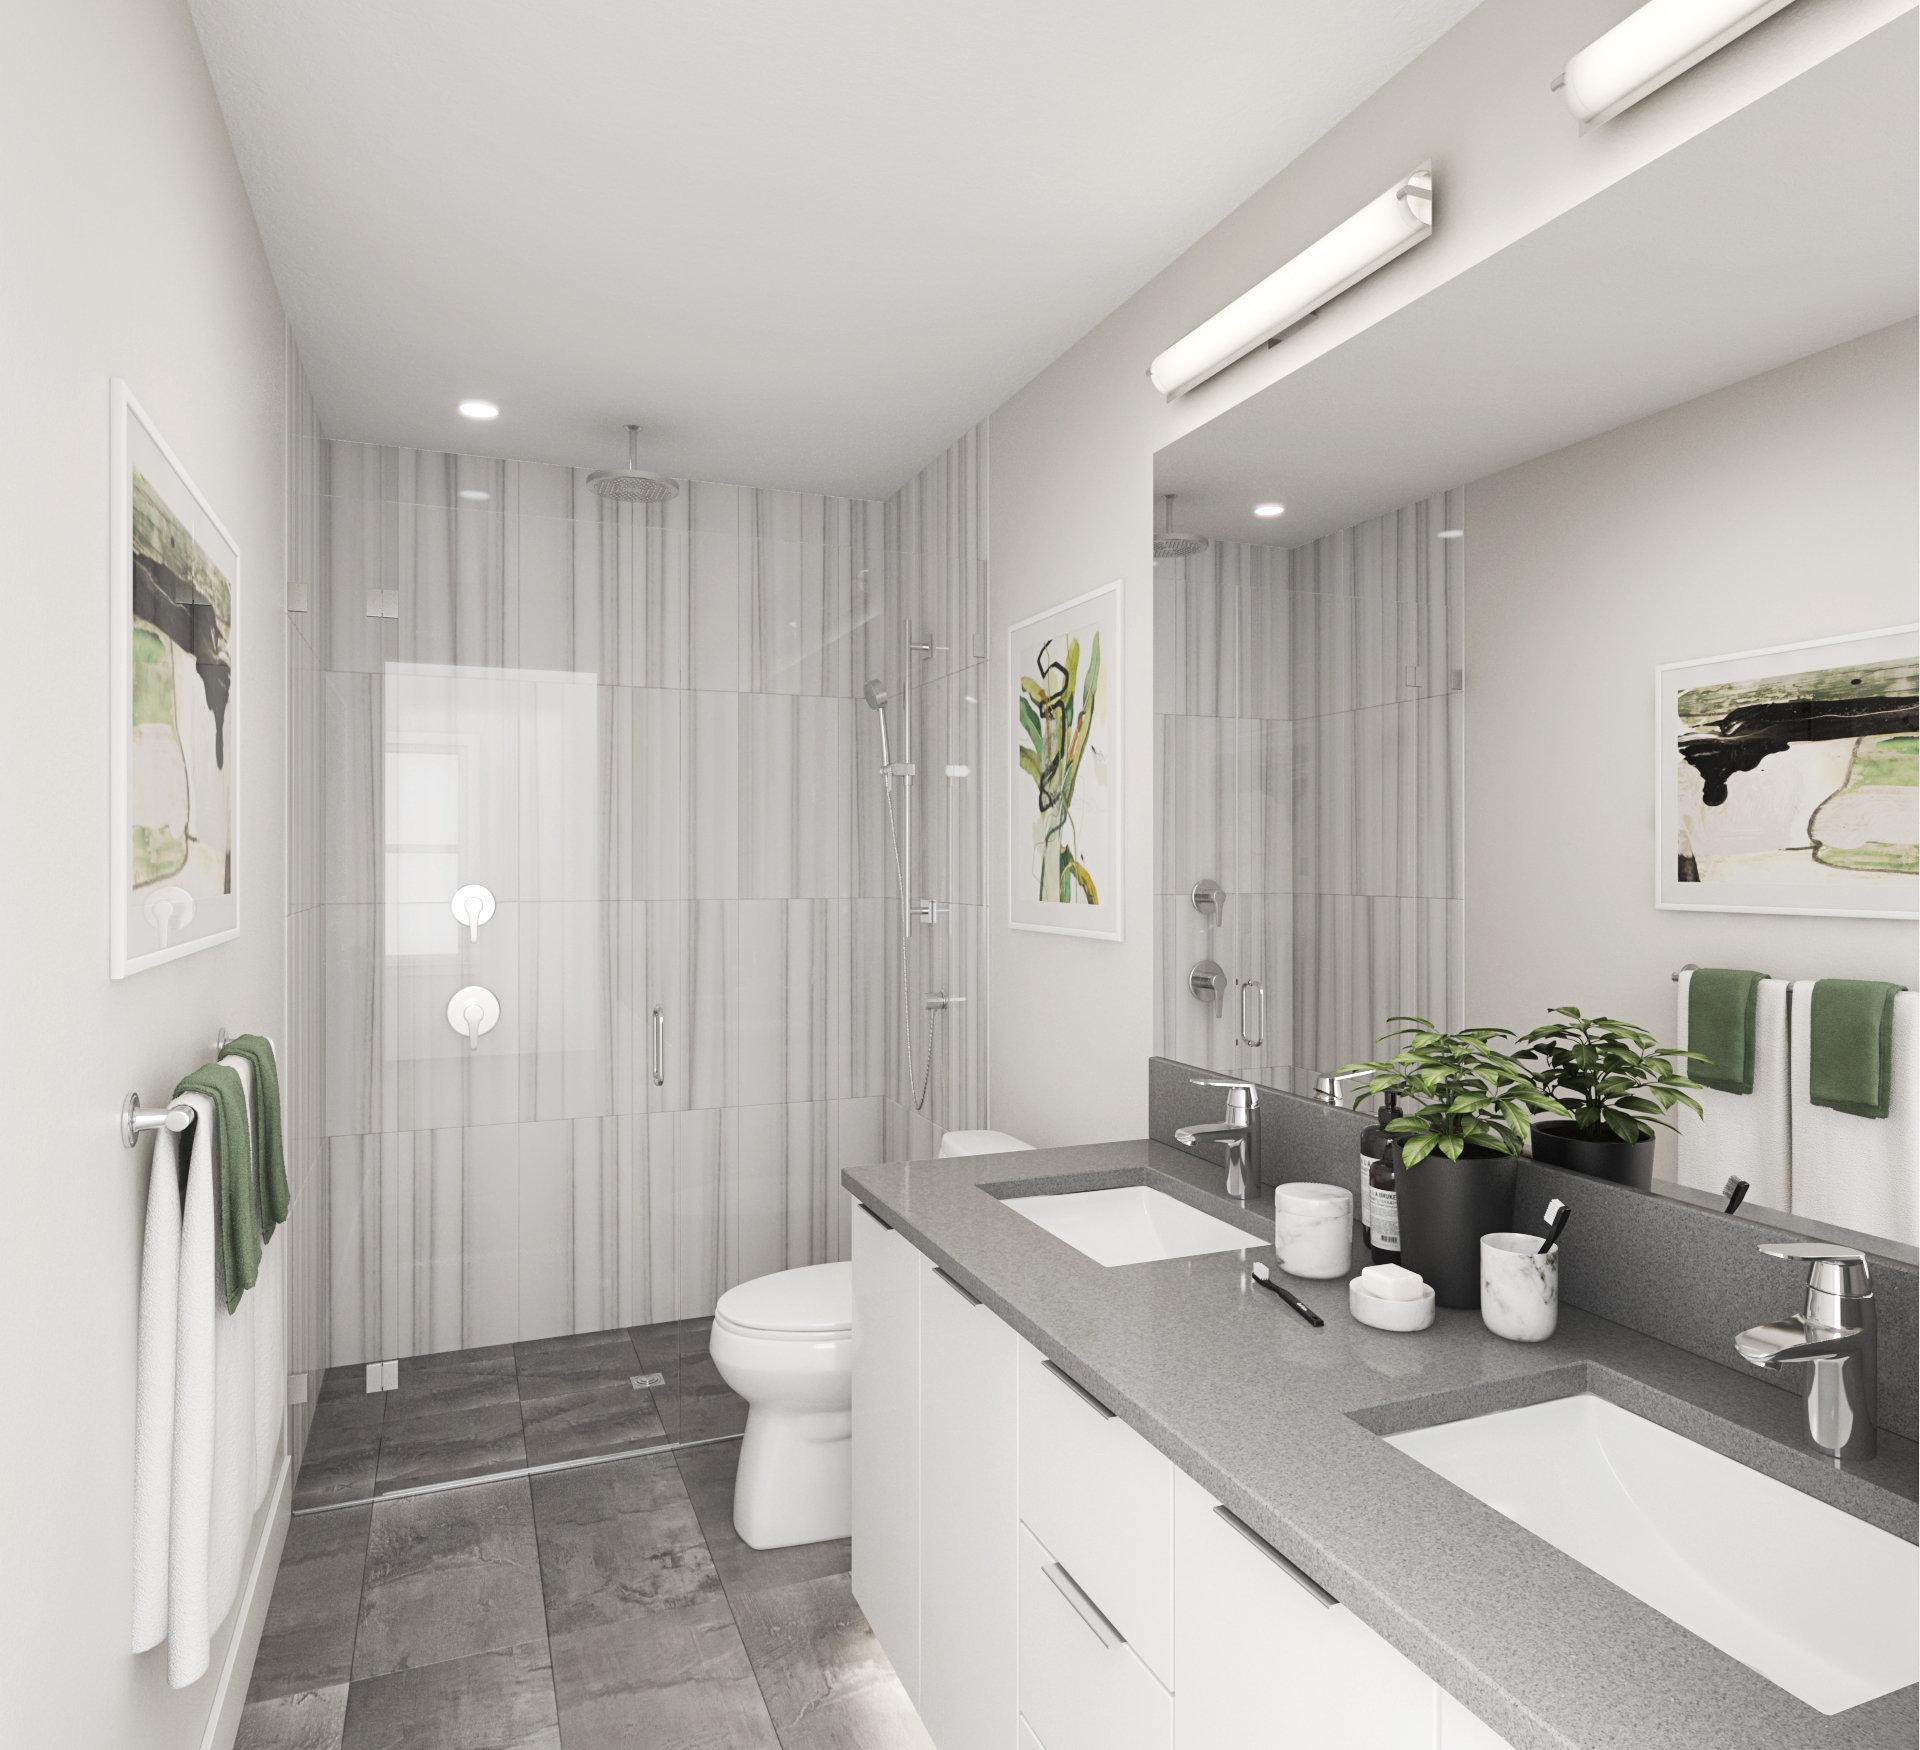 Bathroom - 11641 227 St, Maple Ridge, BC V0V 0V0, Canada!